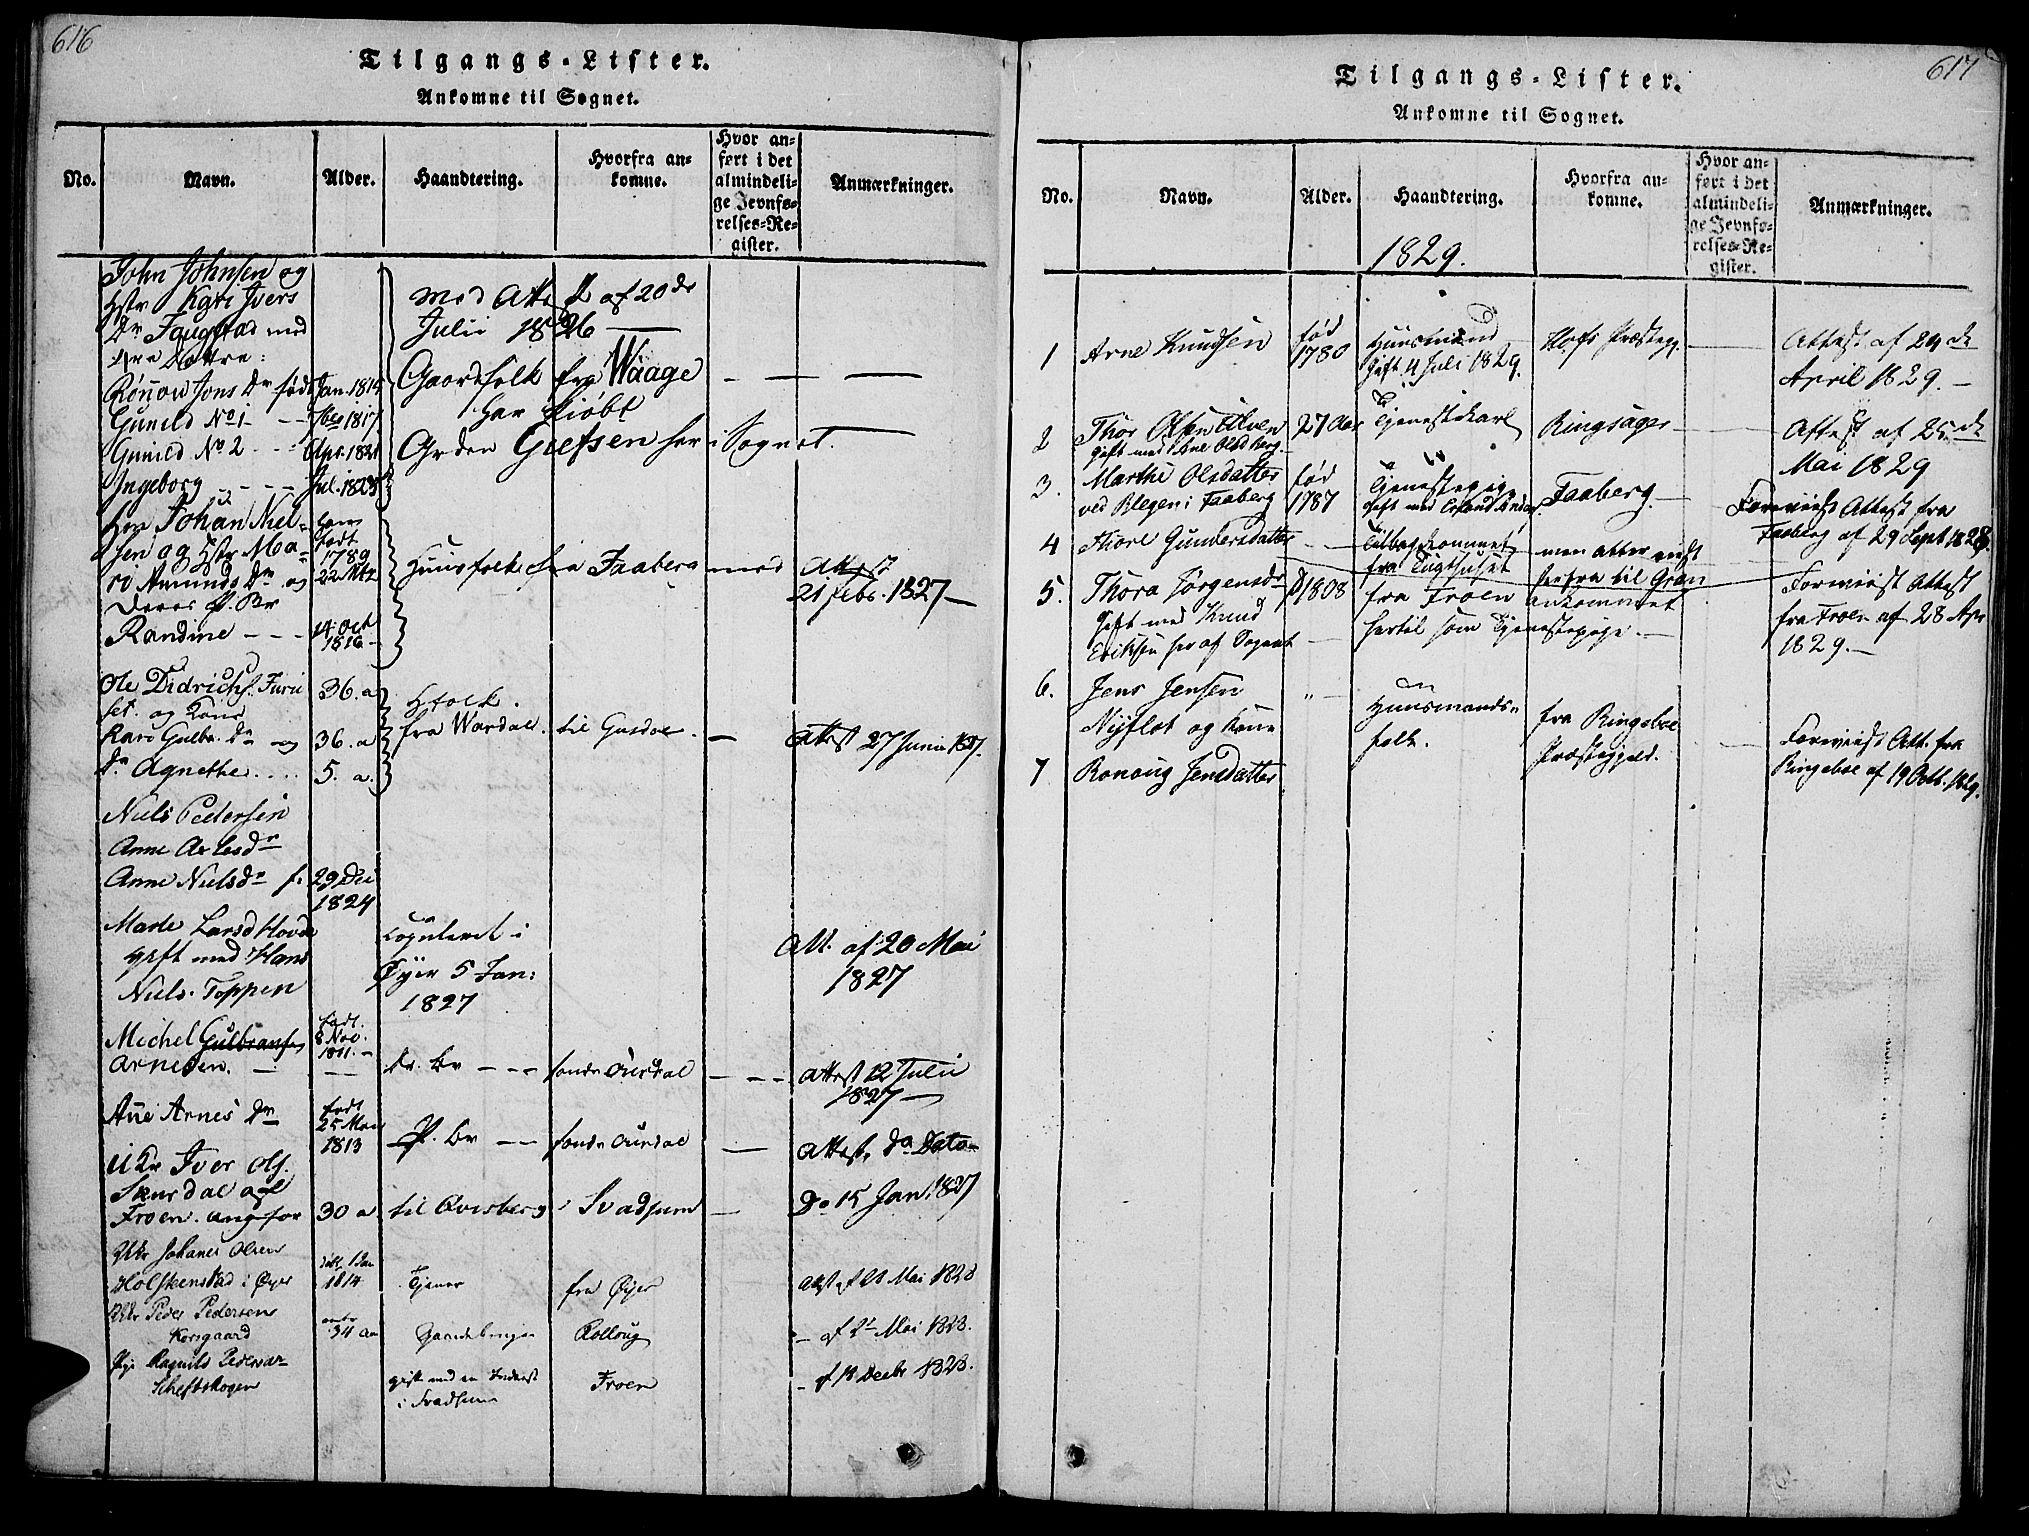 SAH, Gausdal prestekontor, Ministerialbok nr. 5, 1817-1829, s. 616-617